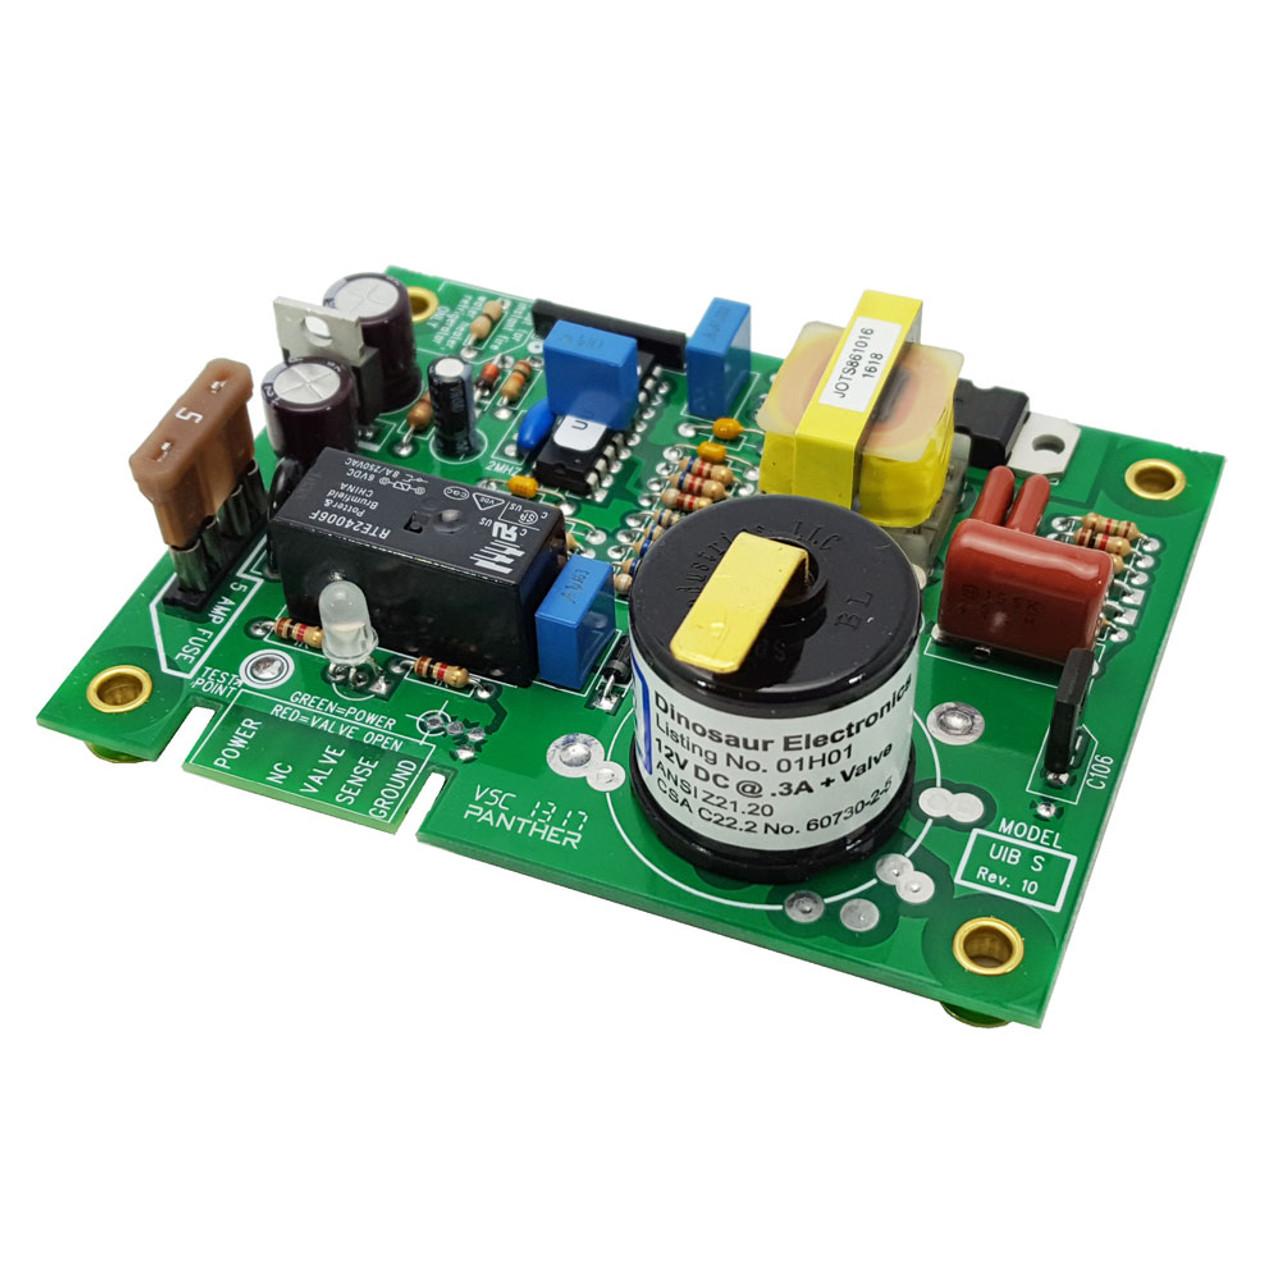 medium resolution of dinosaur elect uib s universal ignitor control board small atwood 93865 circuit board wiring diagram